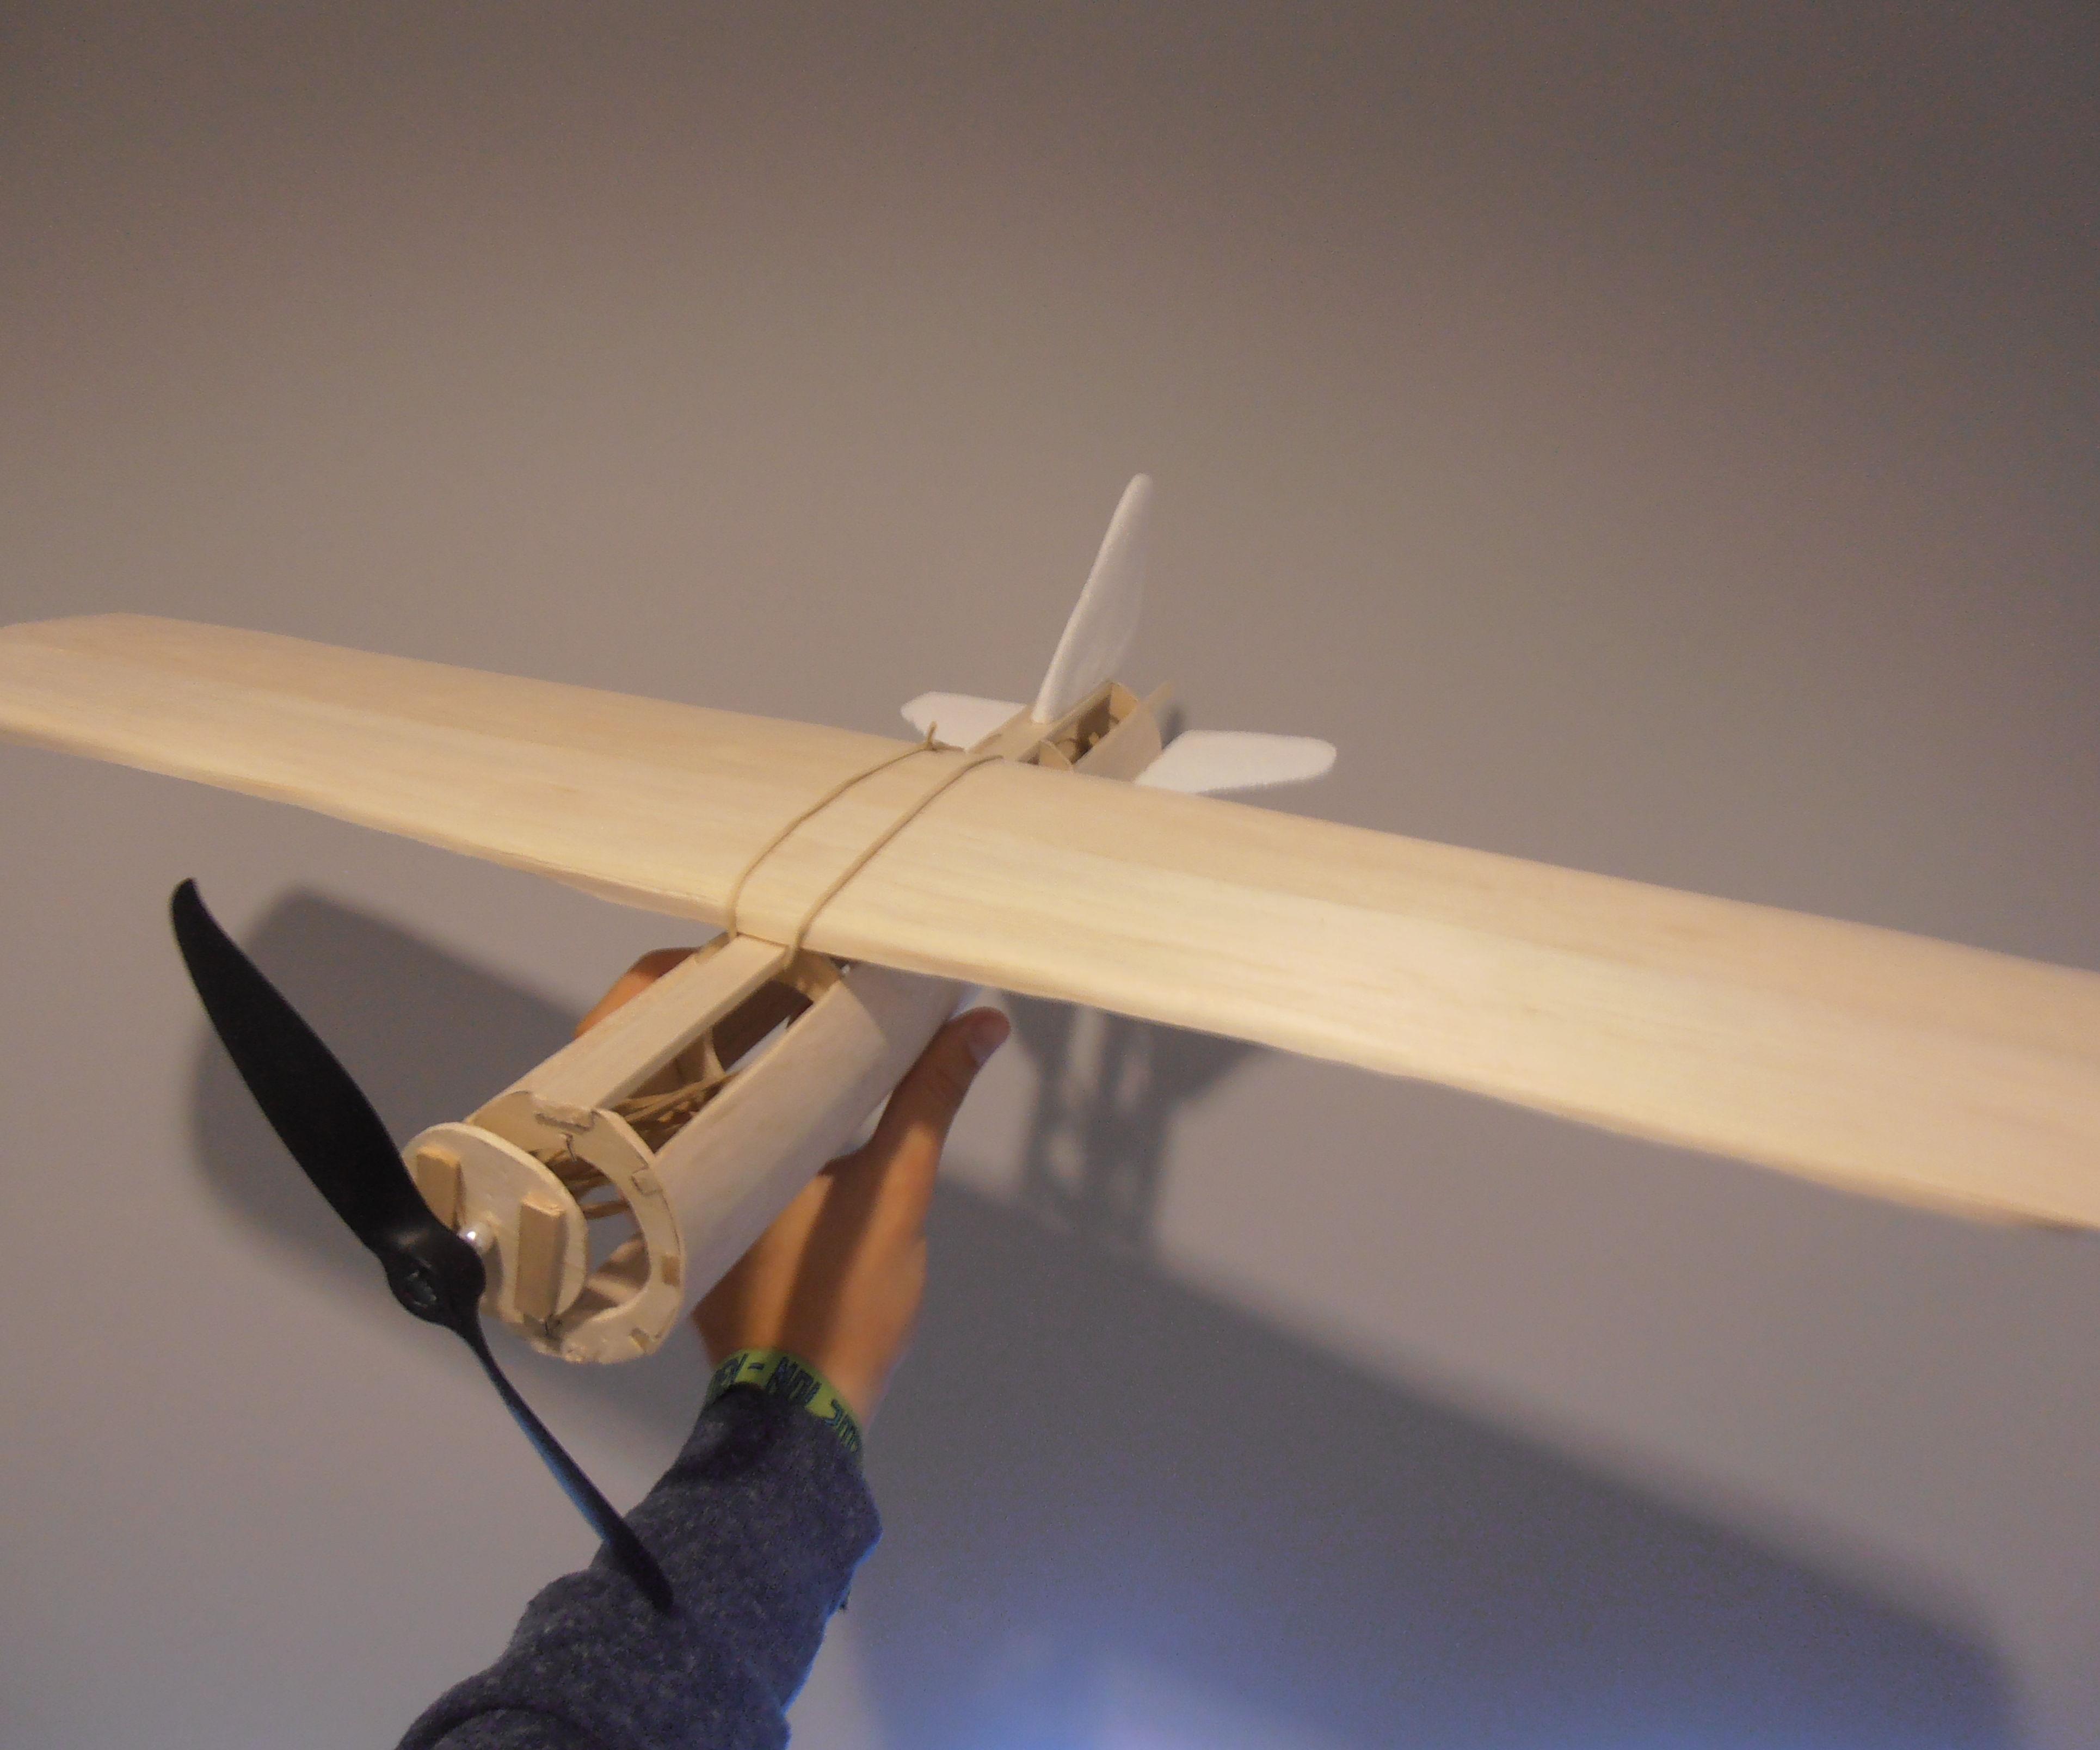 Rubberband balsa airplane